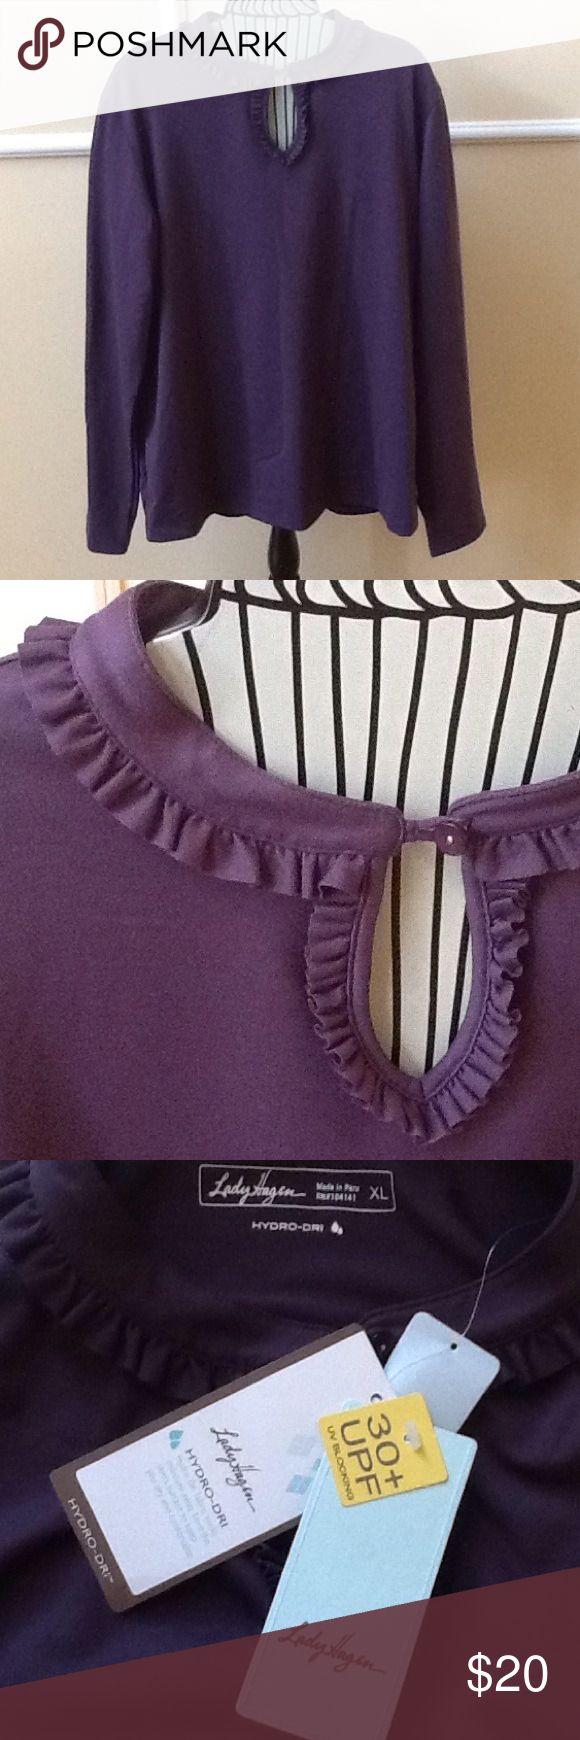 NEW - Lady Hagen top. Size XL.. Hypro dry fabric Purple velvet. 30+ UPF UV blocking. Hydro dry fabric Lady Hagen Tops